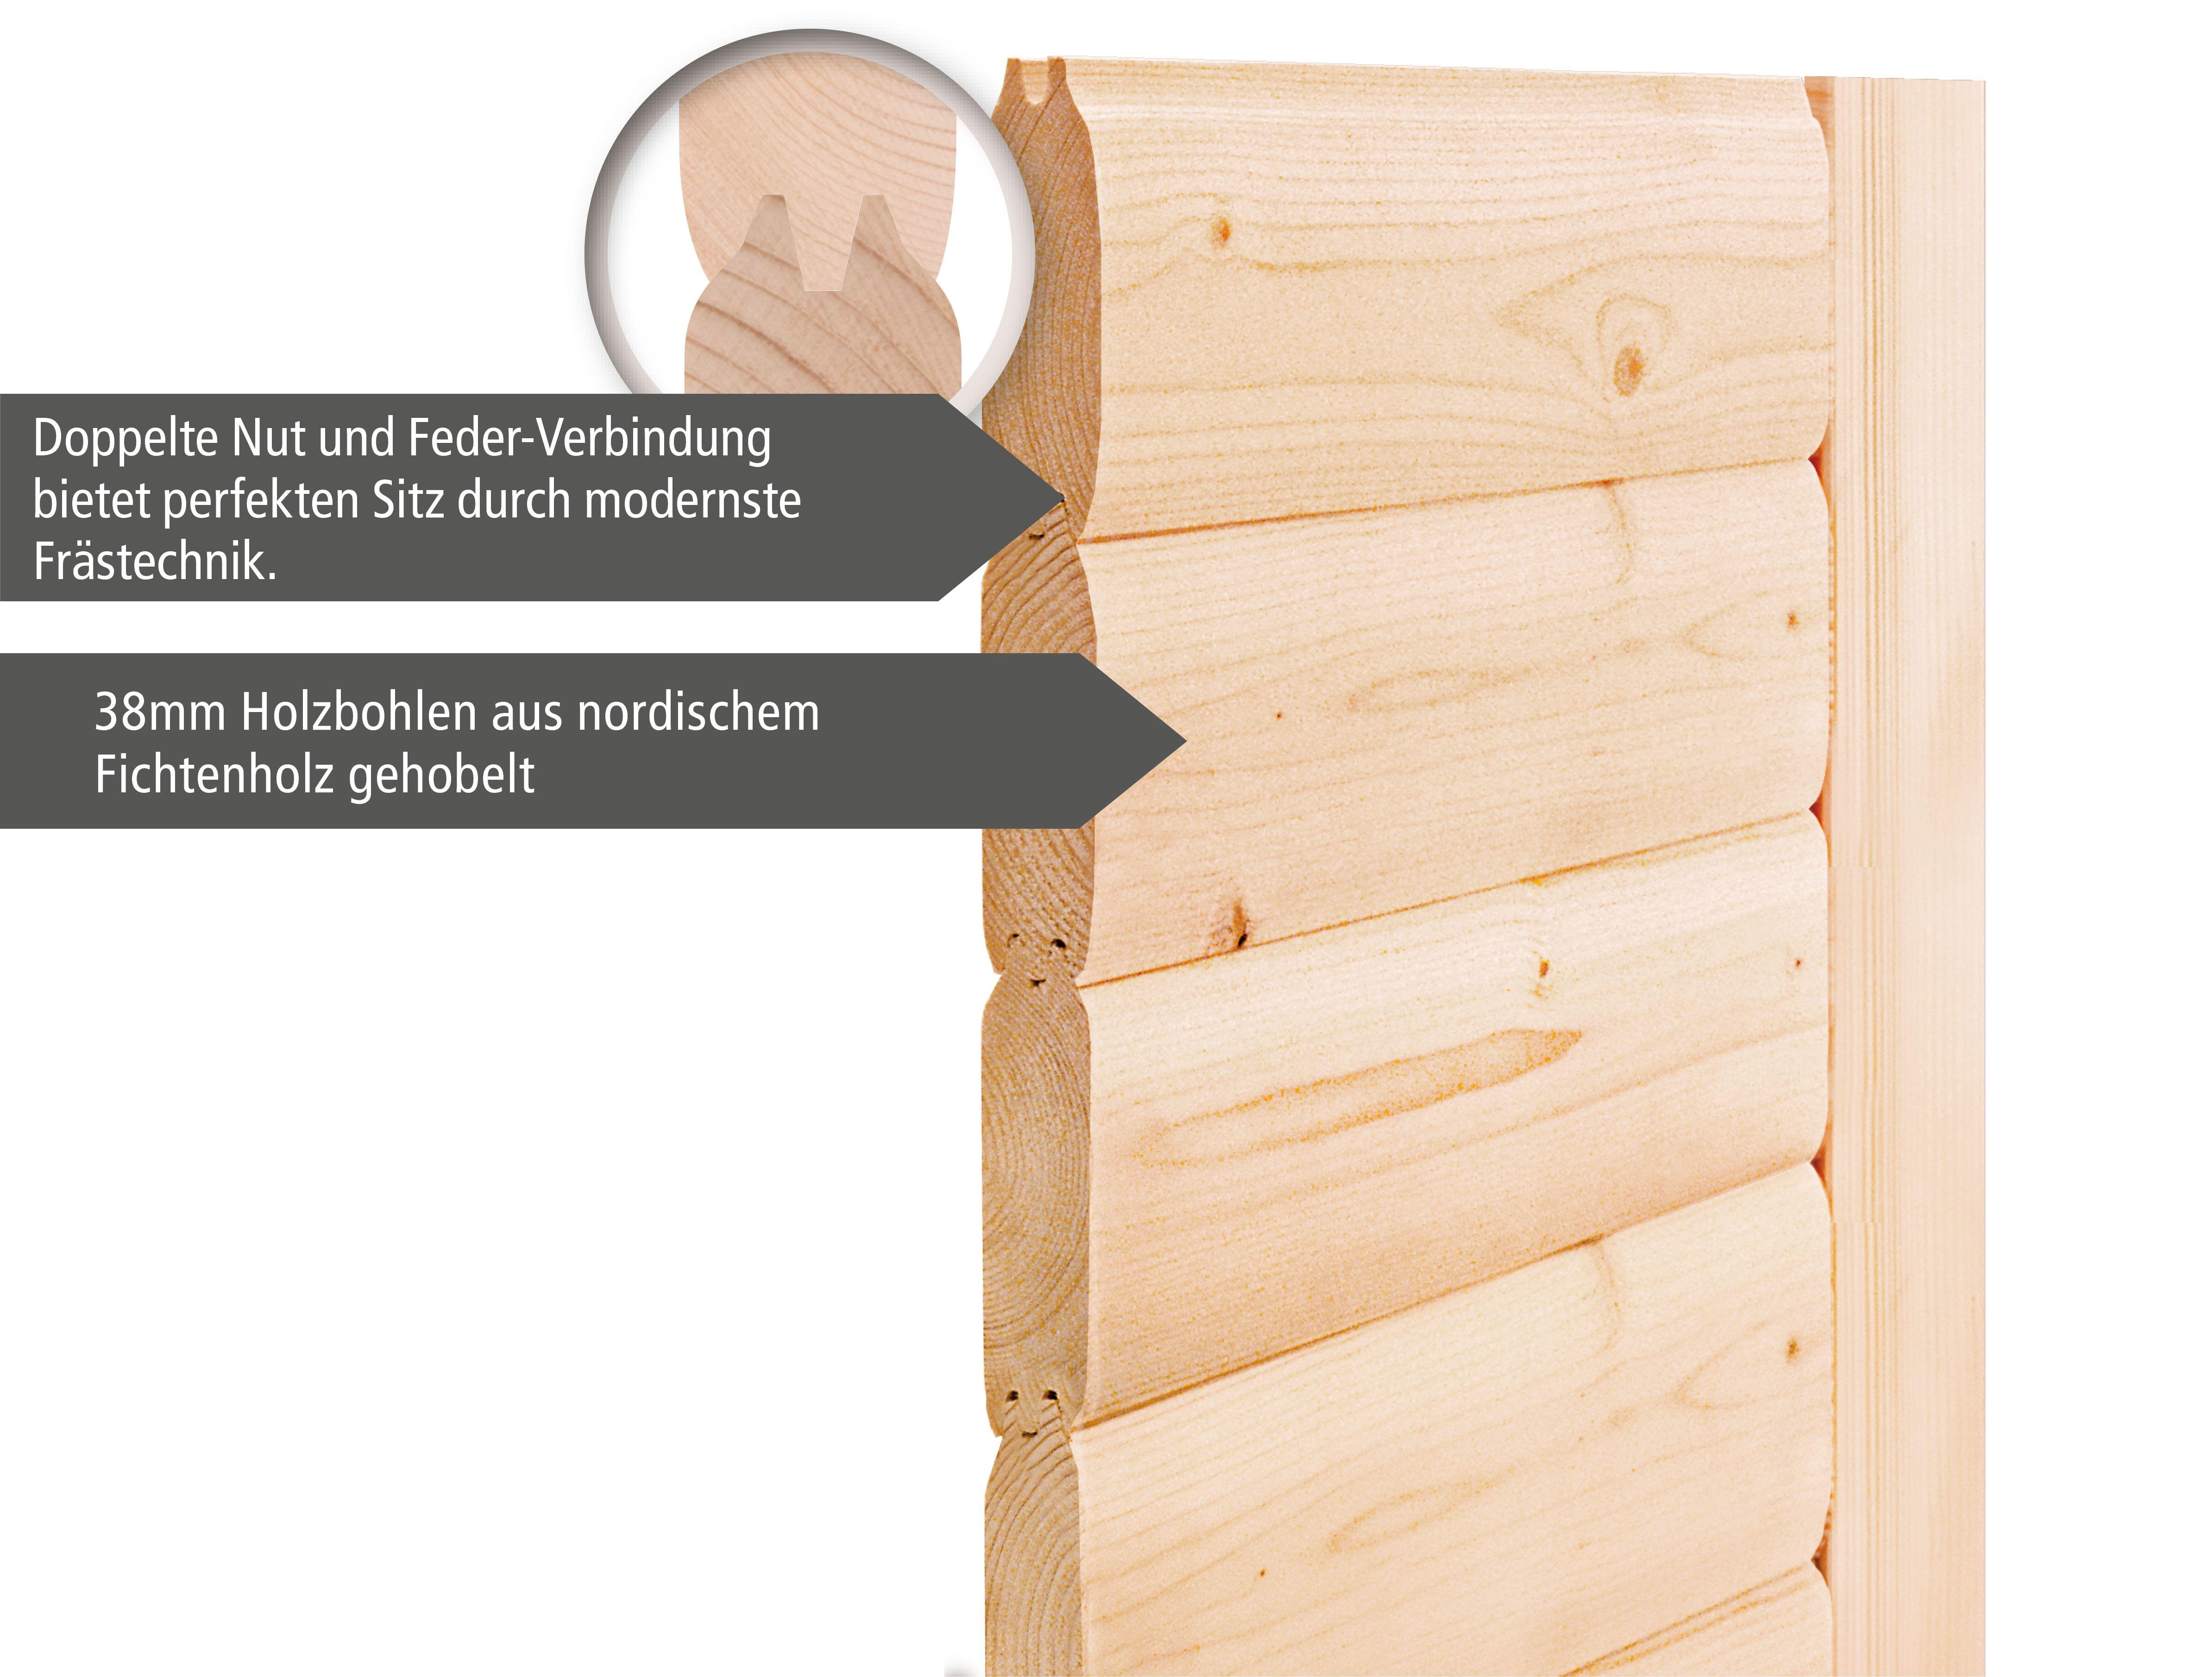 Woodfeeling Sauna Tilda 38mm Dachkranz Saunaofen 9kW intern Bild 7